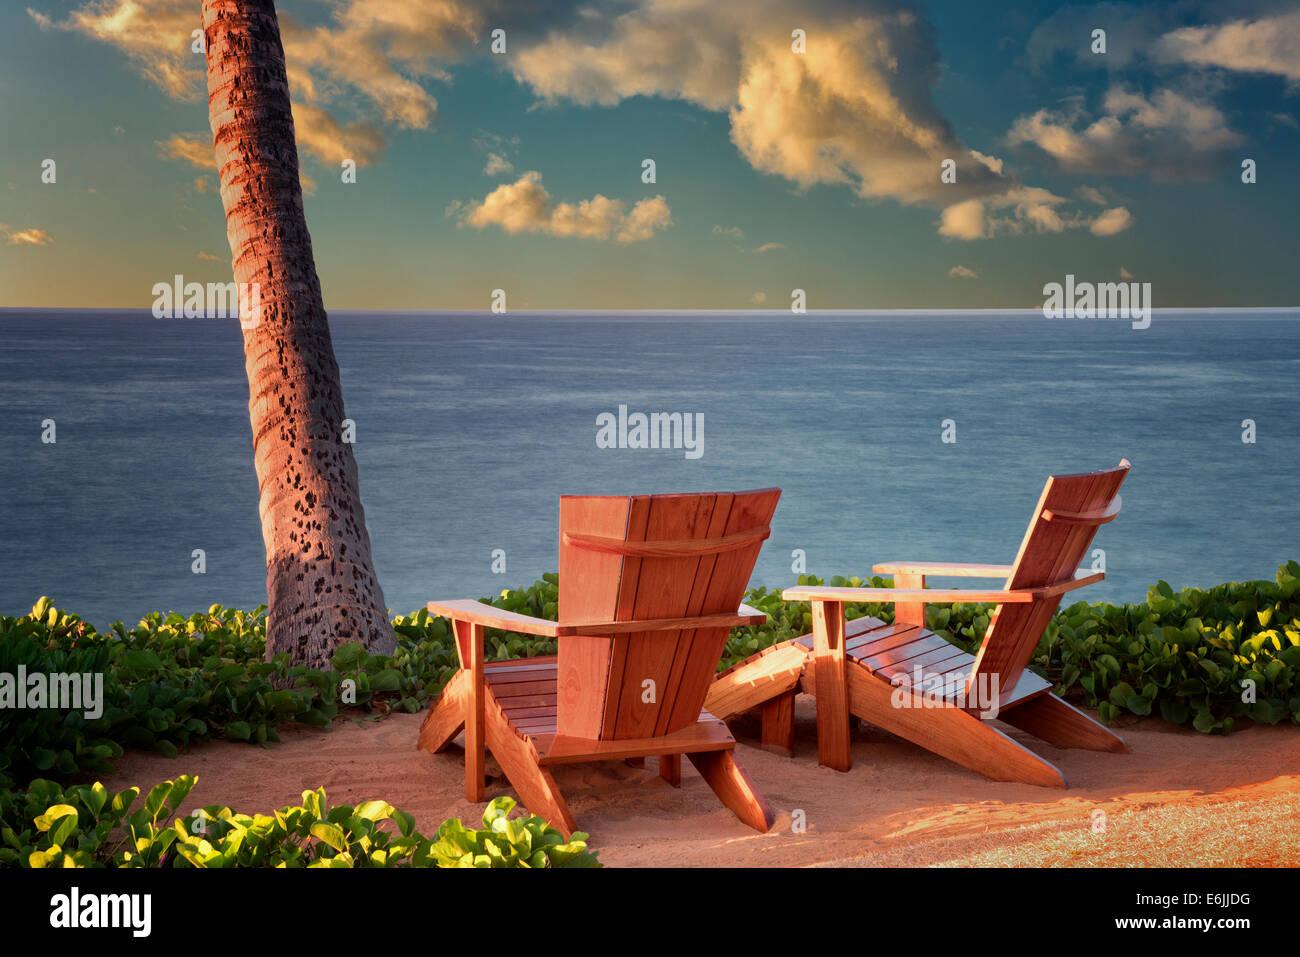 Zwei Adirondac Stühlen mit Blick auf Meer bei vier Seson. Lanai, Hawaii. Stockbild